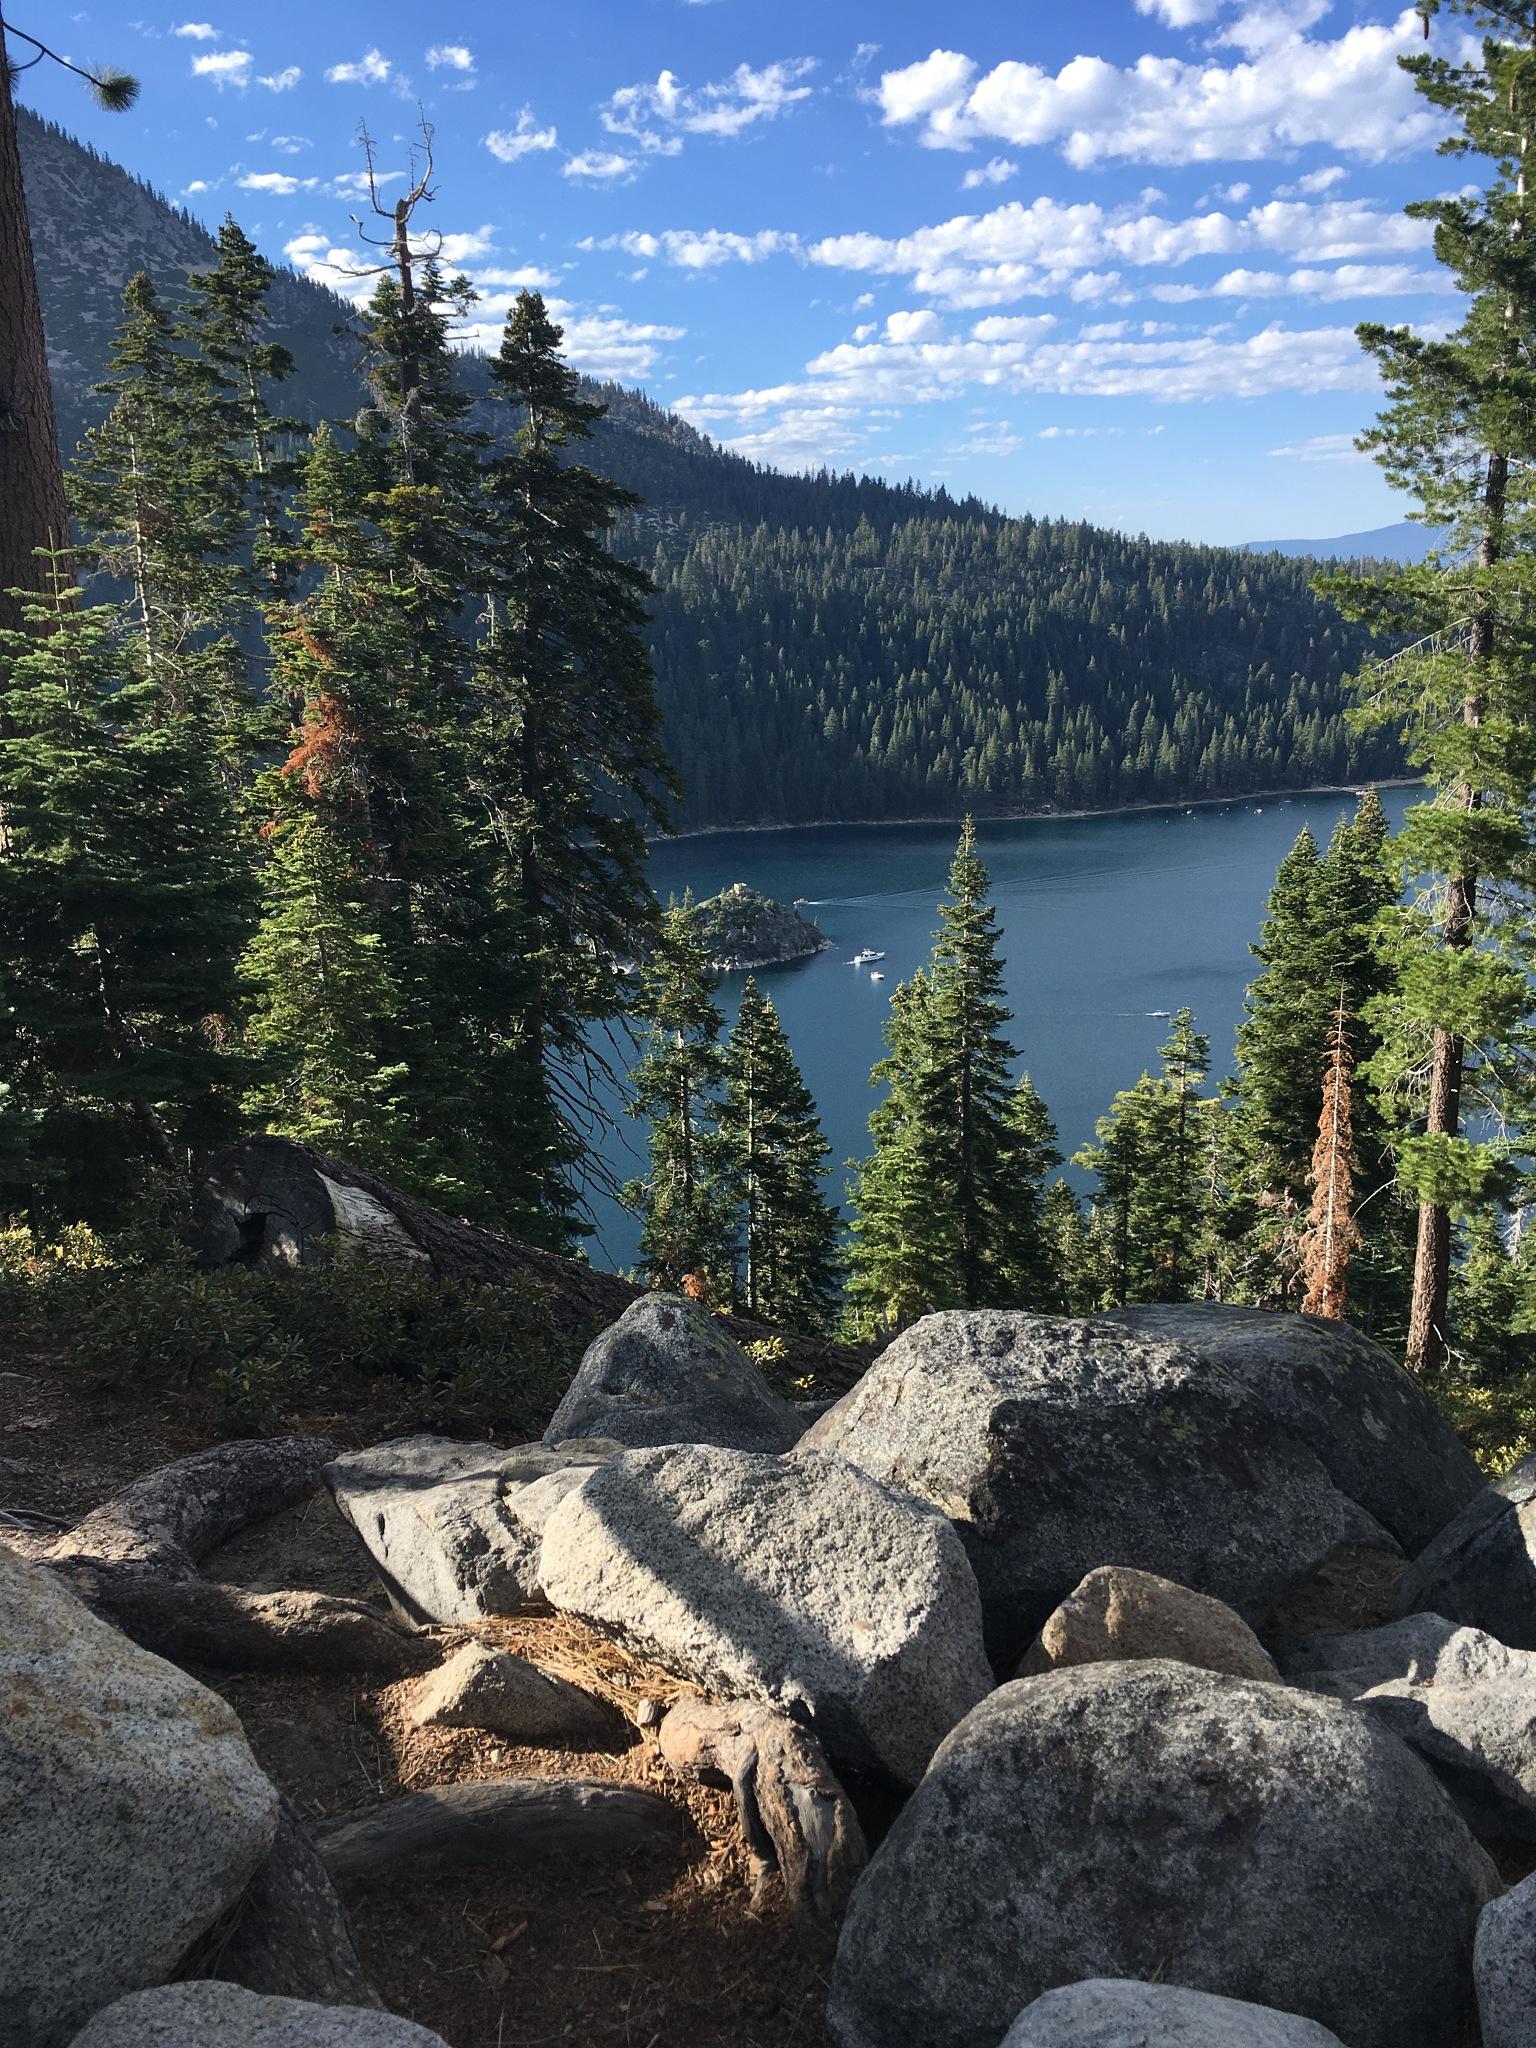 South Lake Tahoe by Victoryyyinjesus